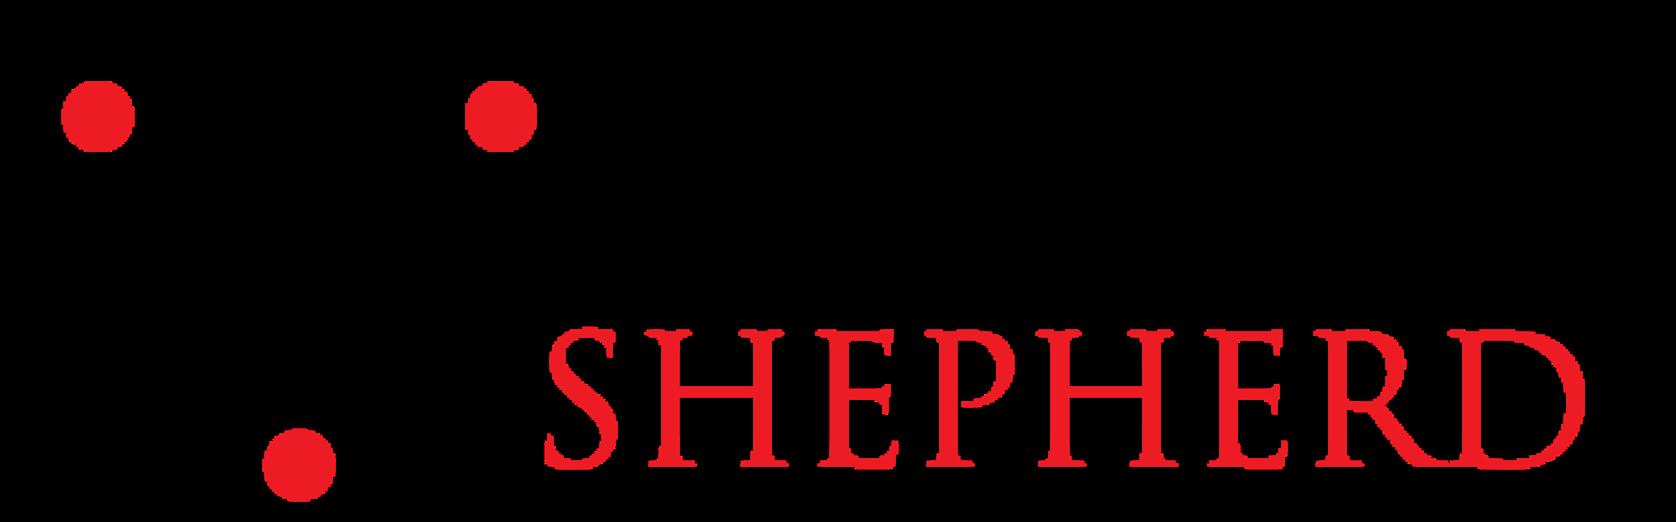 Value-Shepherd-1